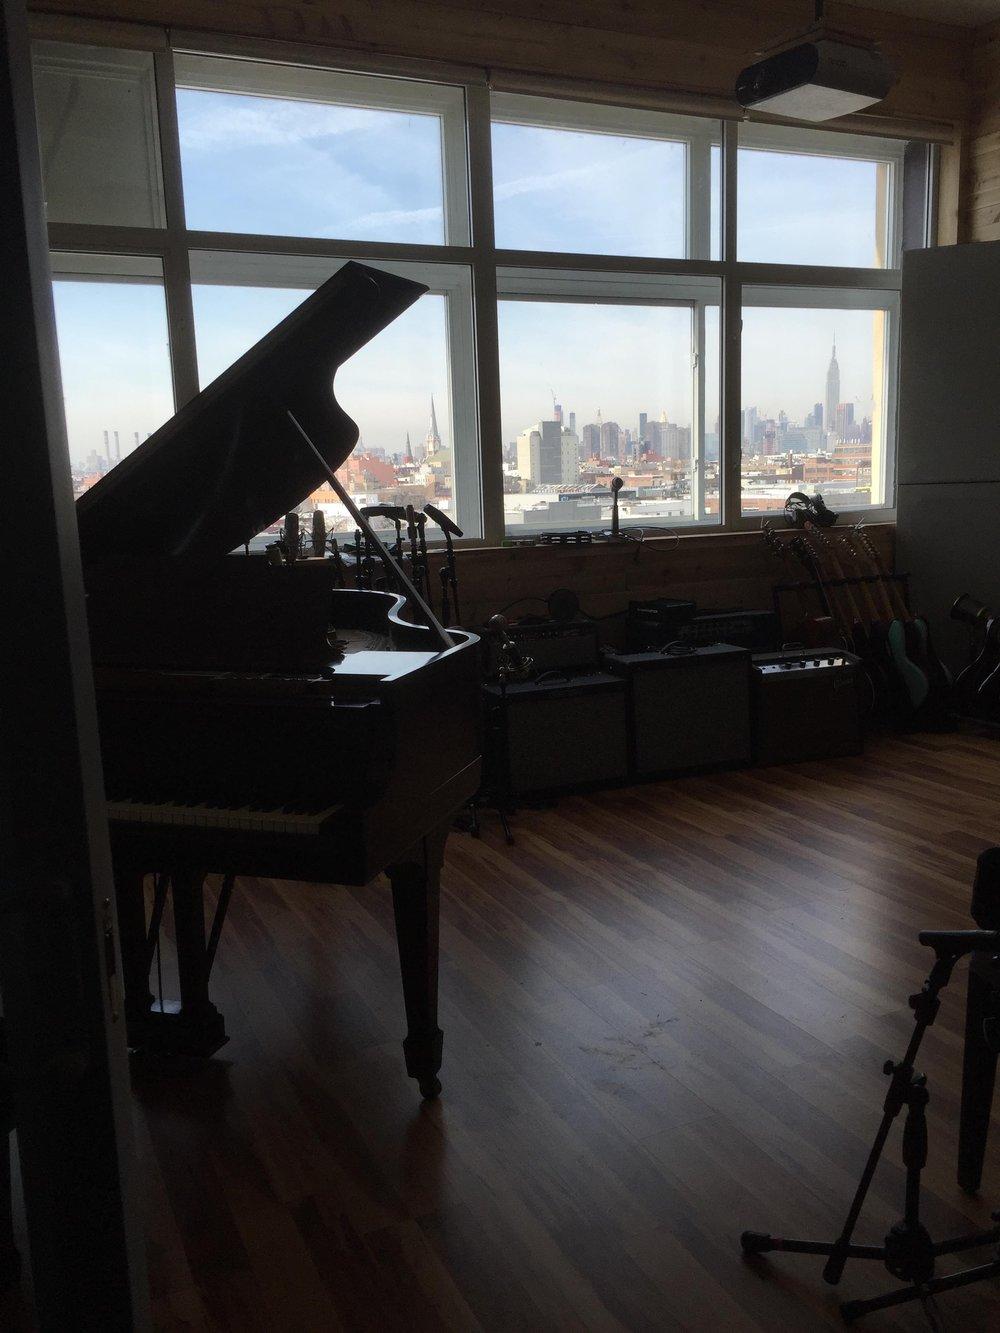 505-Piano-March 2016.jpg